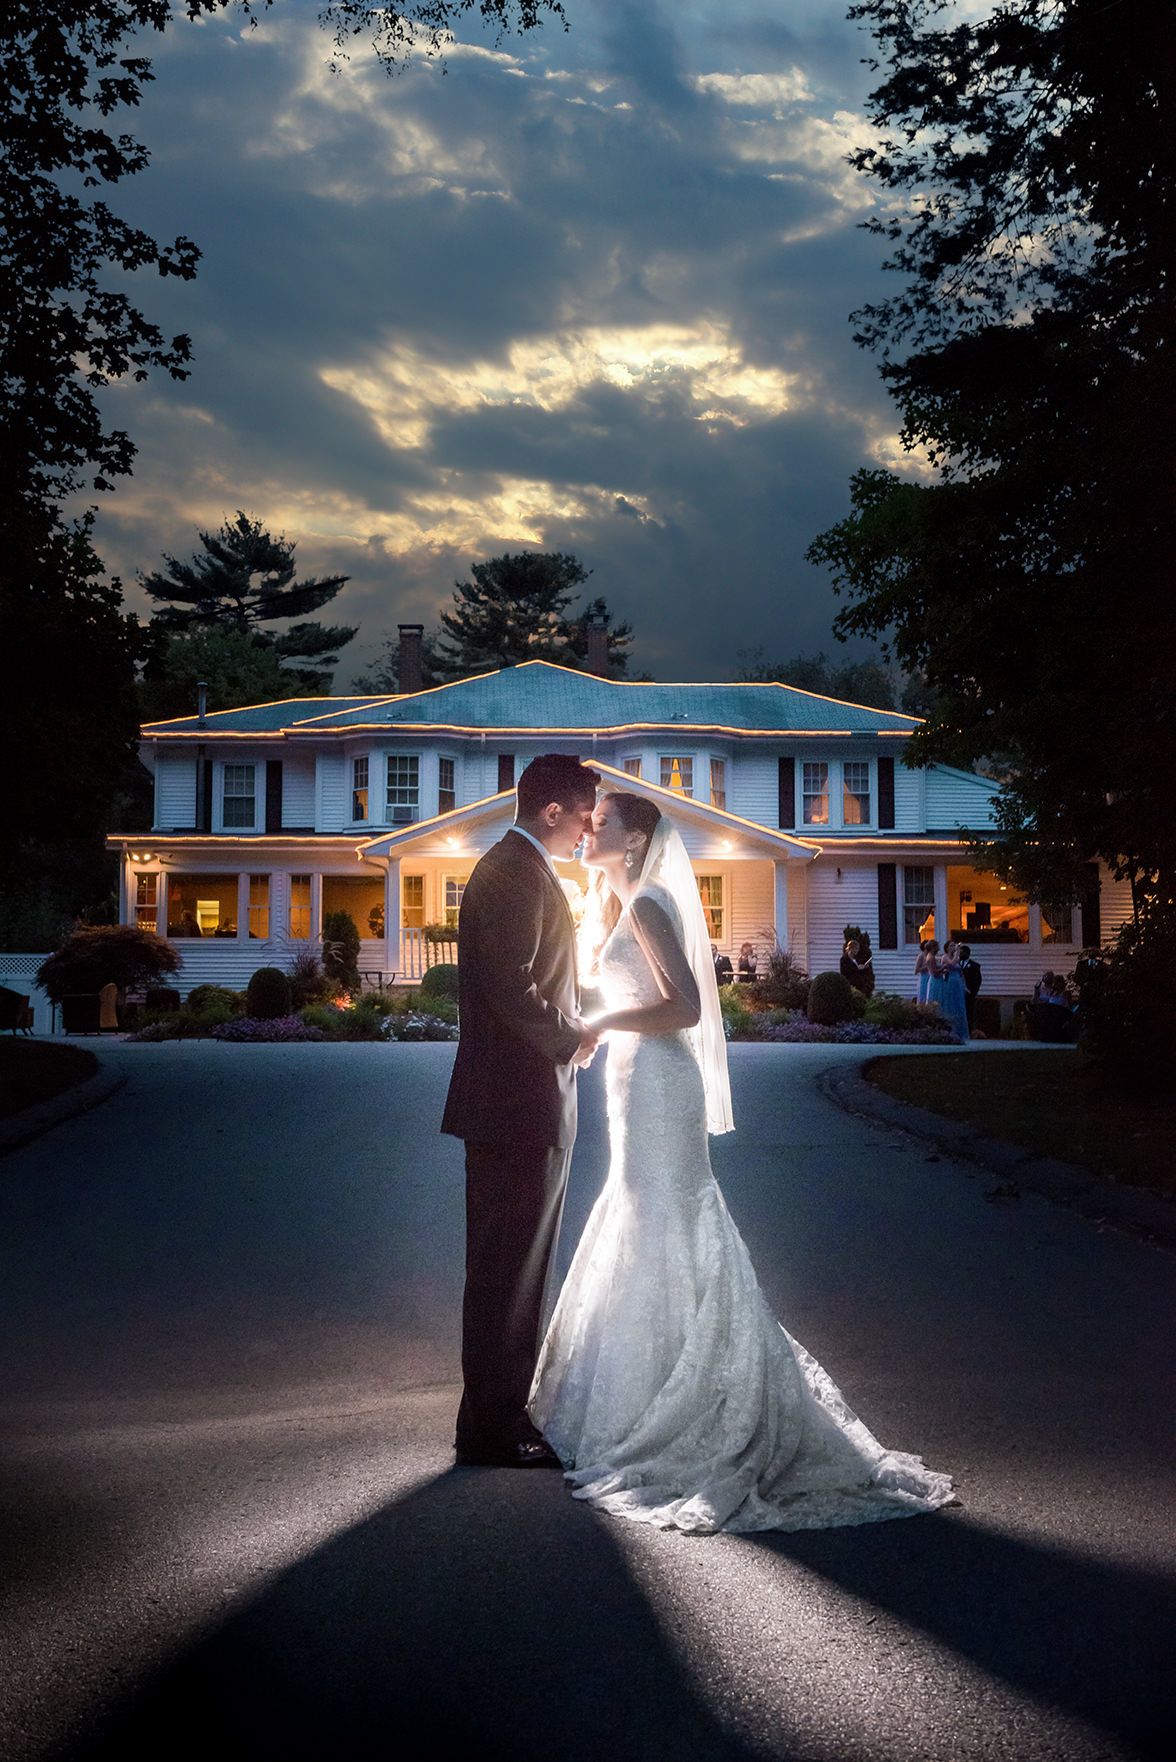 BOSTON-WEDDING-PHOTOGRAPHERS-THE-YODSUKARS-3838-Edit_Flattened-ID-227c41a9-a934-4d2e-ef37-92cdbe7aa55e.jpg